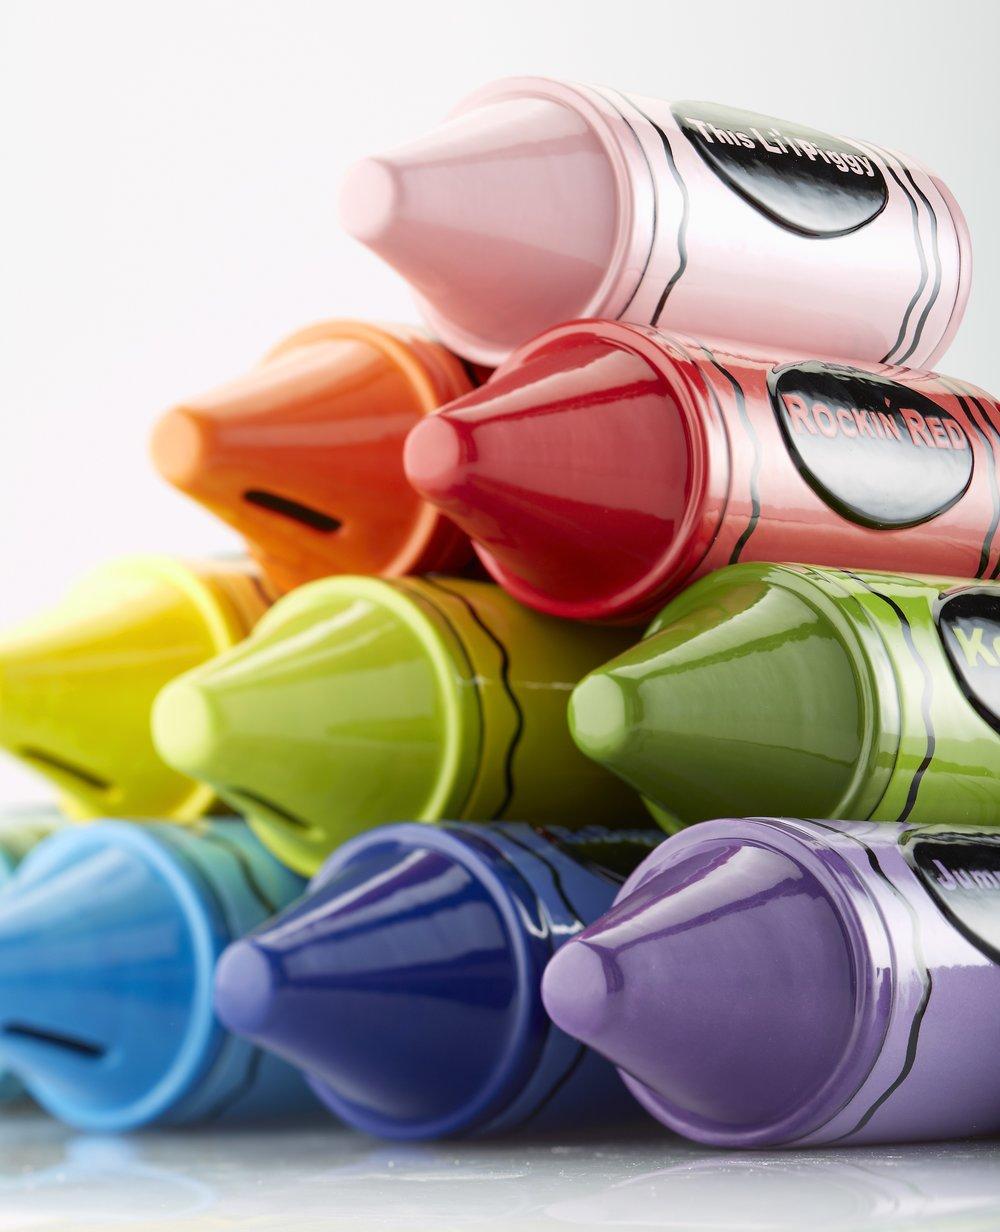 Crayons5_Cropped1.jpg